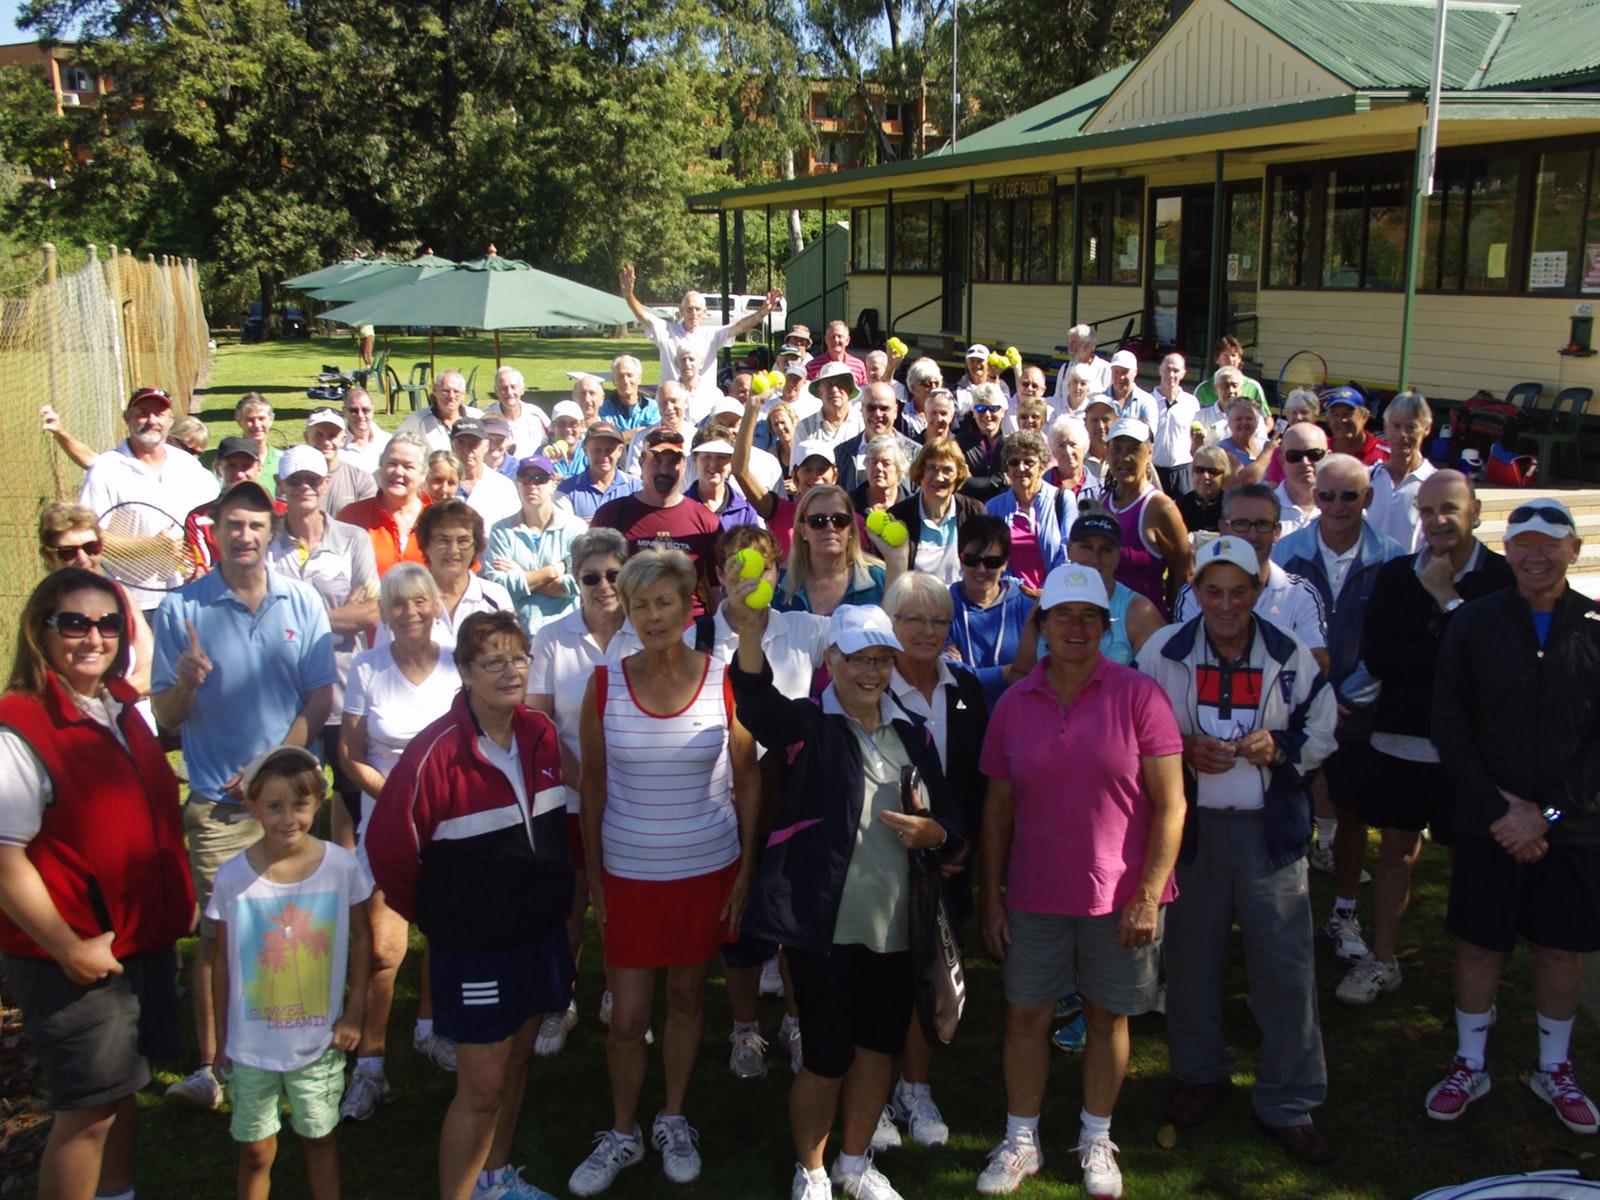 Wangaratta Lawn Tennis Club 91st Annual Tournament